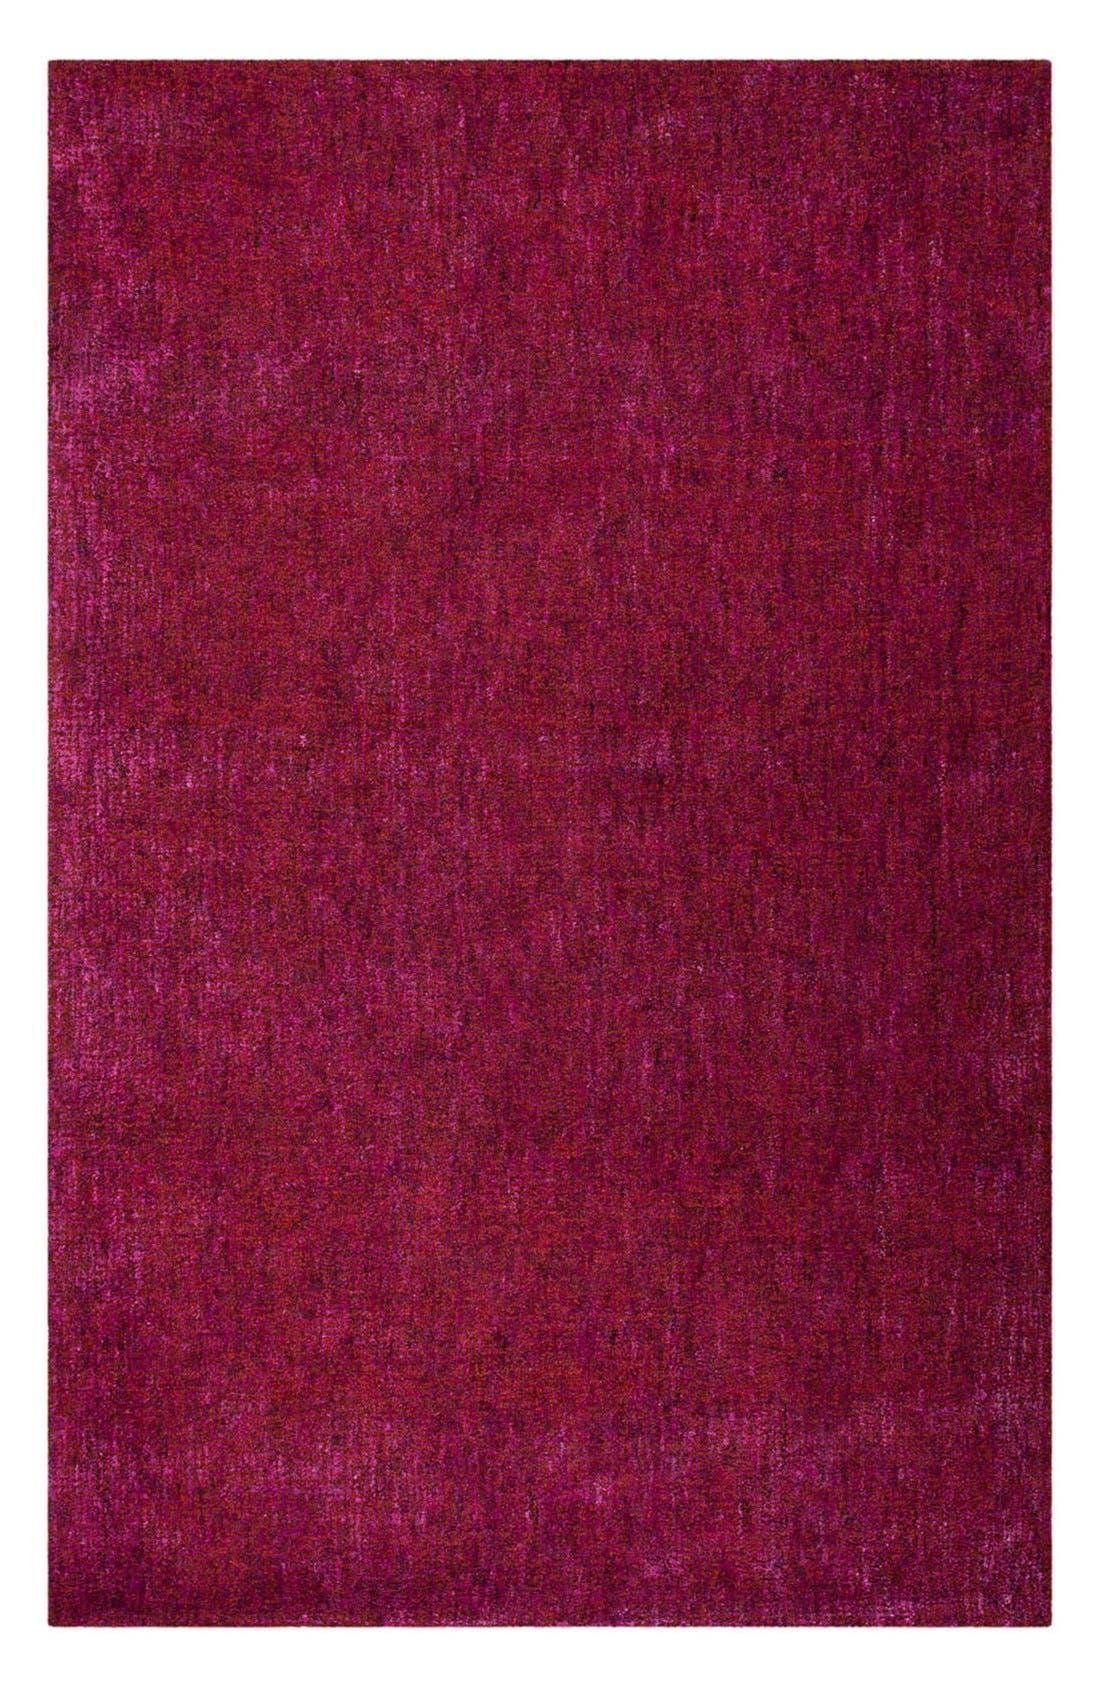 'stuyvesant' rug,                         Main,                         color, 600